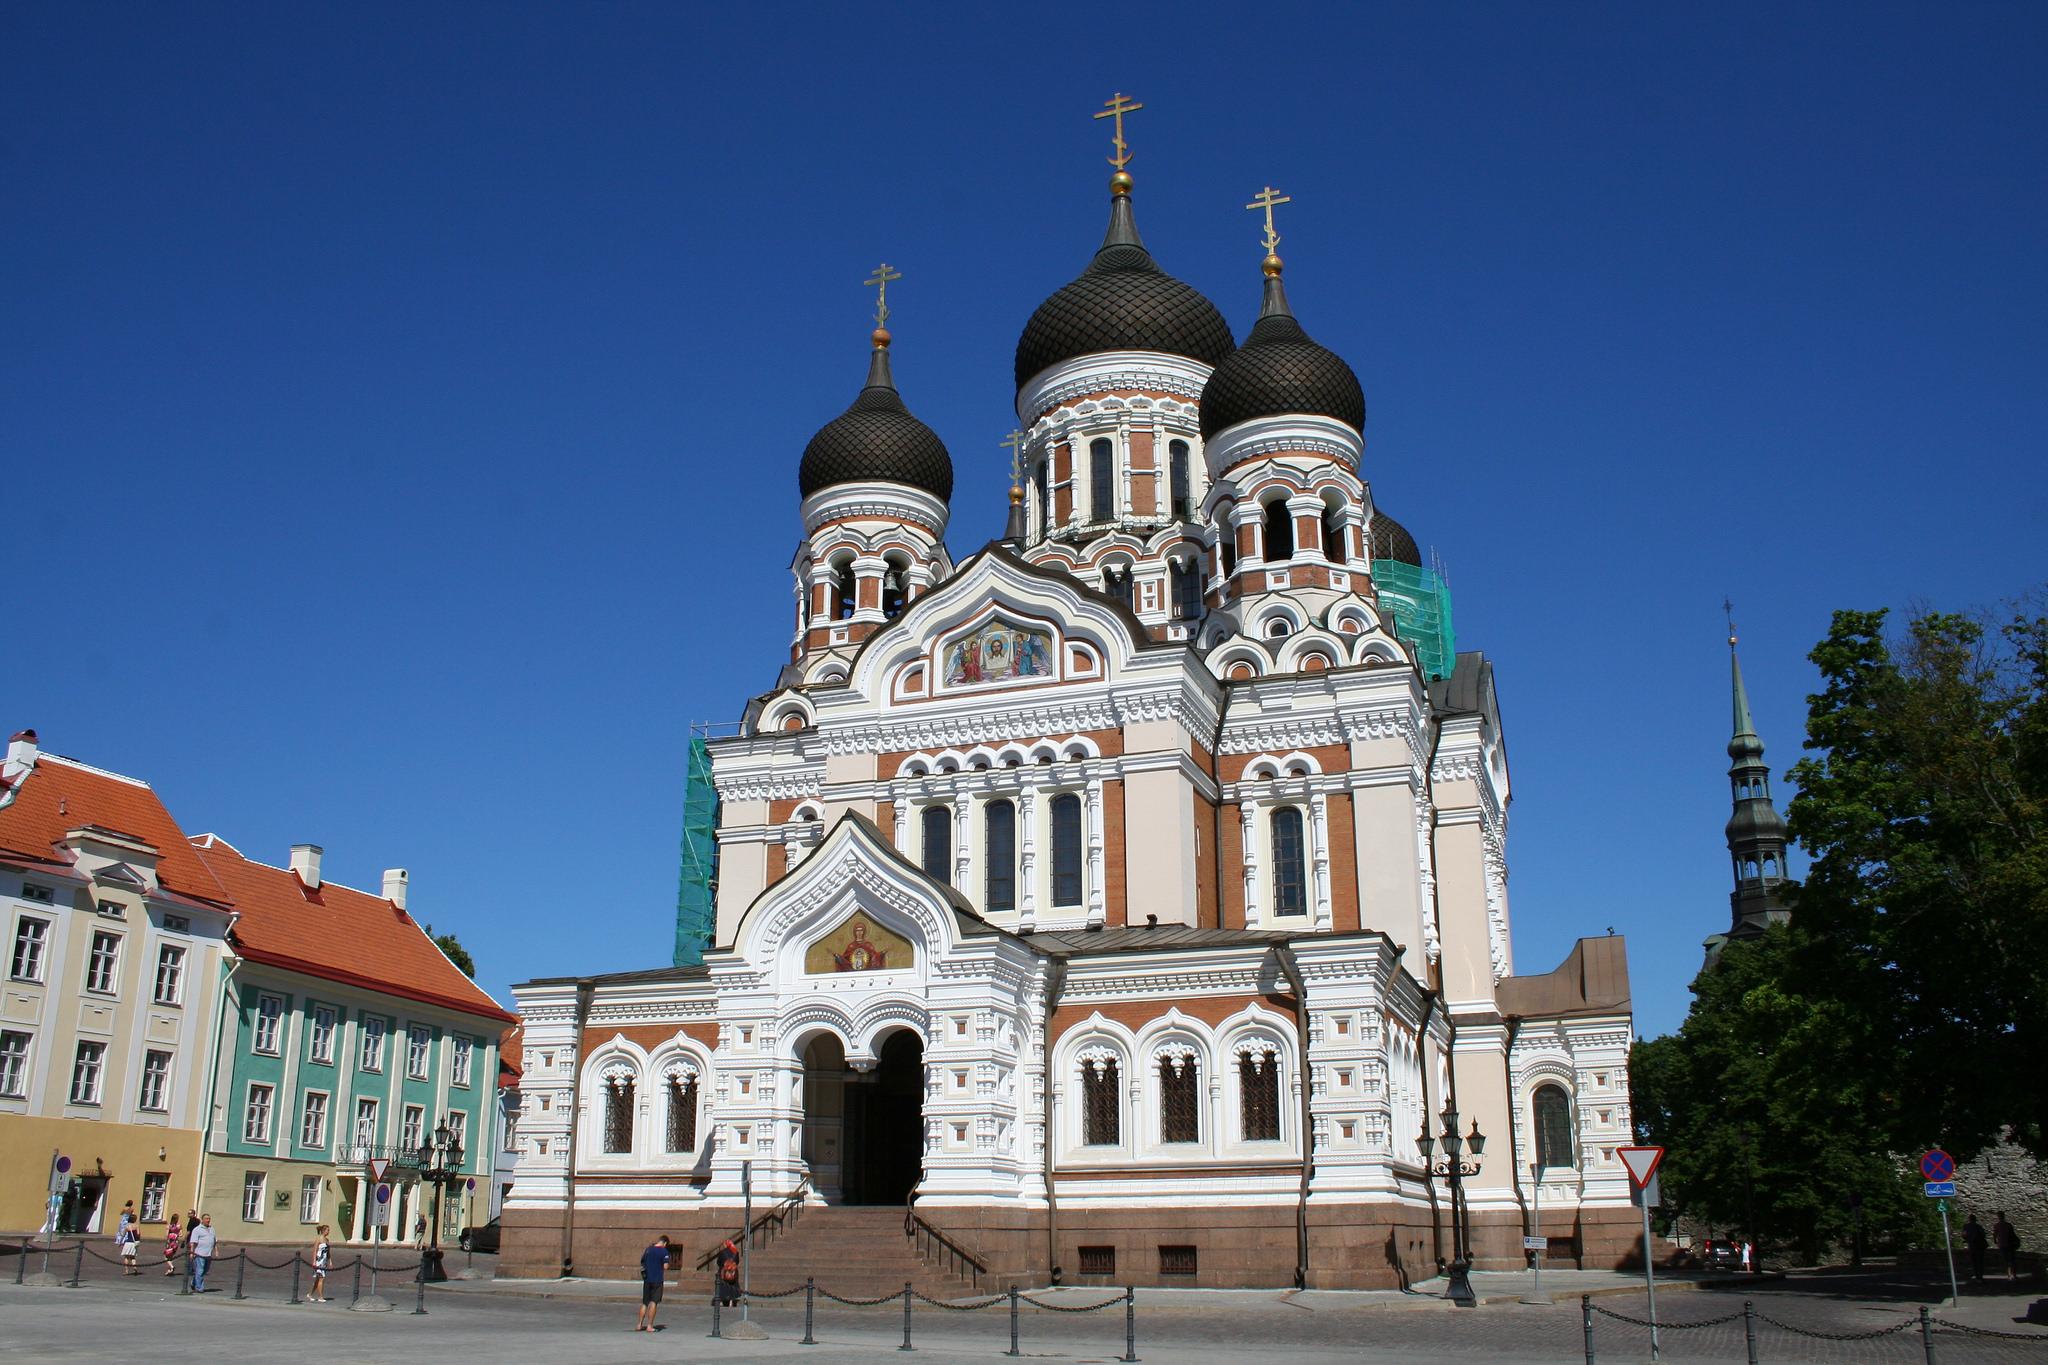 Собор Александра Невского в Таллине, фасад